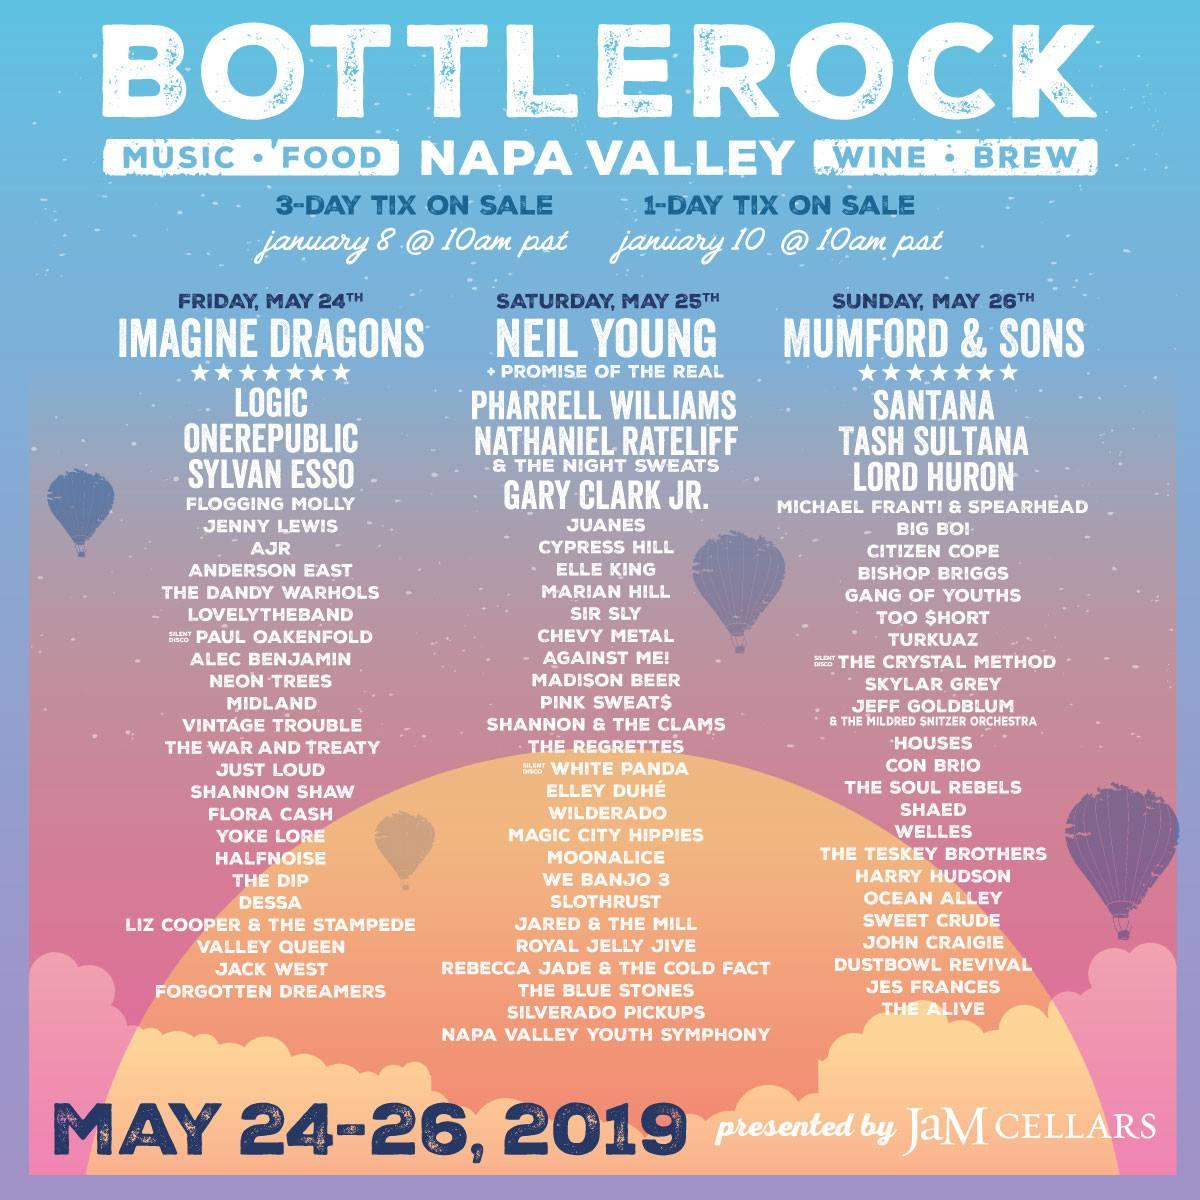 See you in May, Napa 🙌🏾 @BottleRockNapa http://bottlerocknapavalley.com/tickets